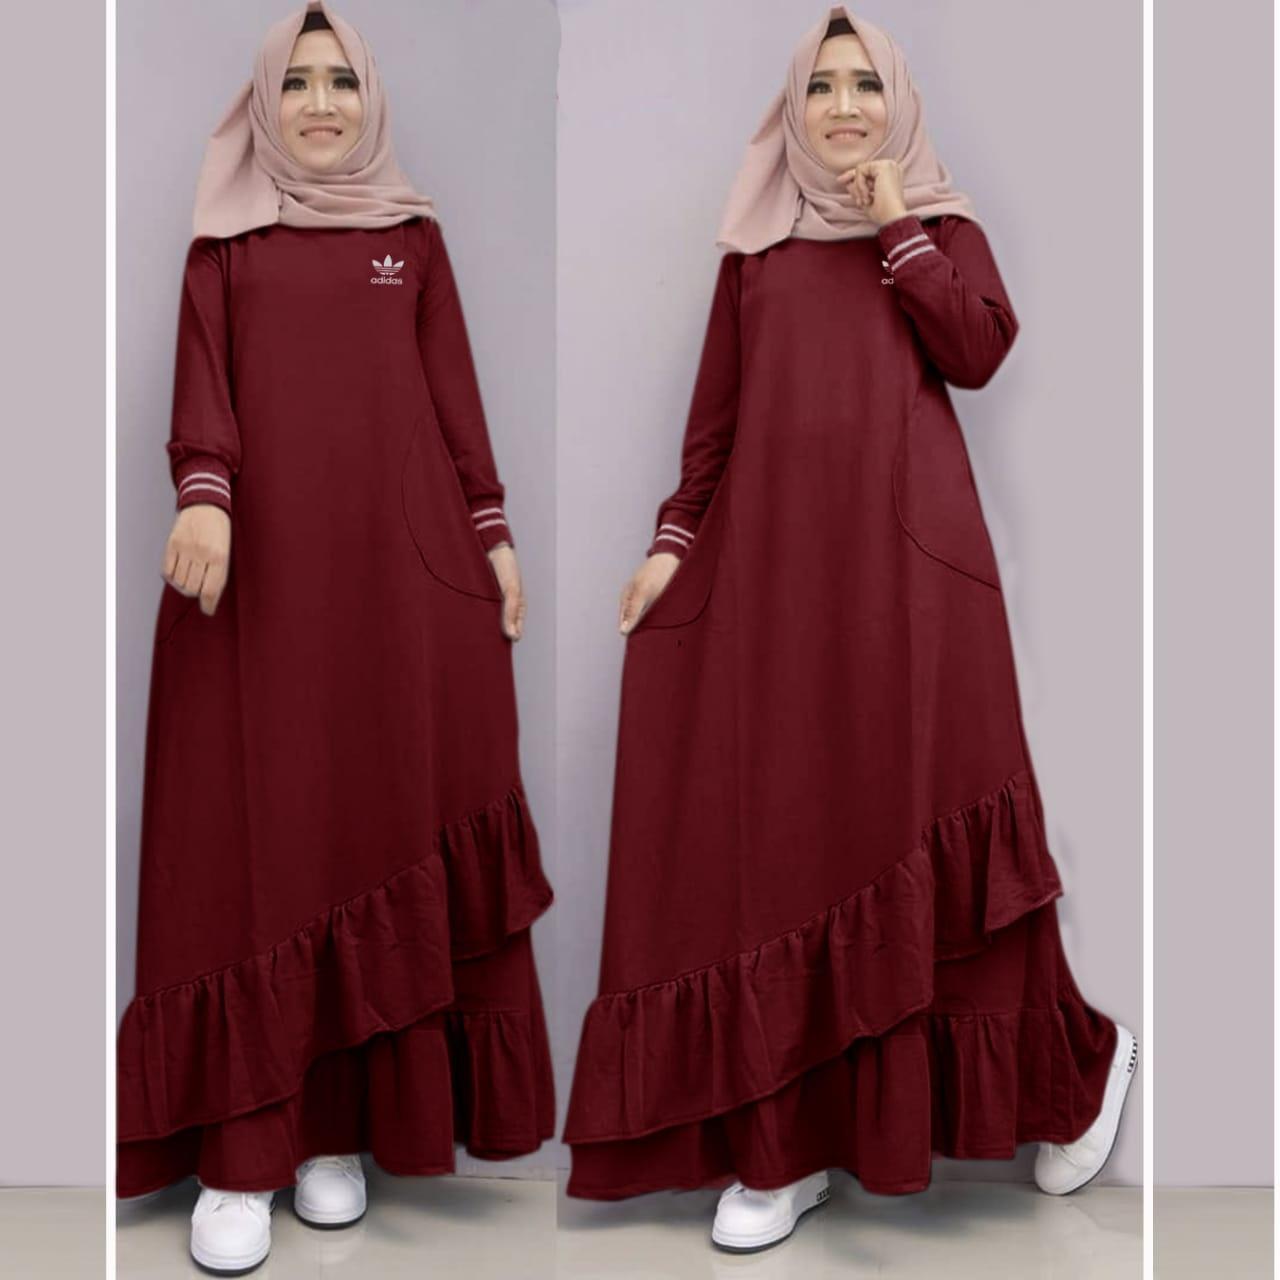 Gamis Hijab Dress Longdress Muslimah Fashion Wanita Pakaian Dress Wanita Catoon Combat ADIDAS_RDDK_Shop_nov_